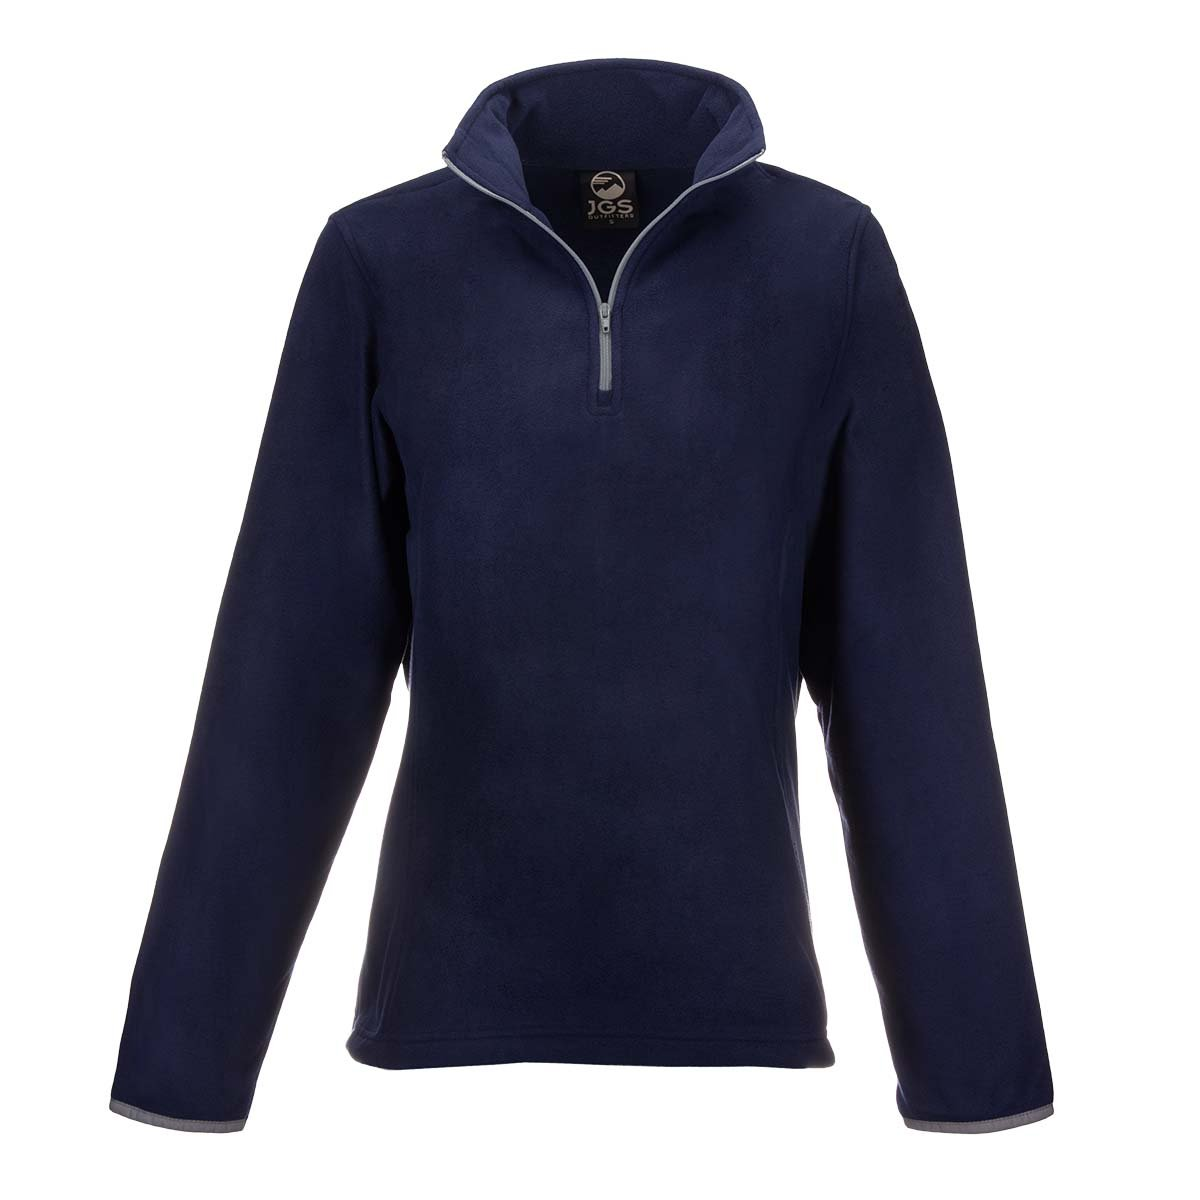 JGS Outfitters Polar Fleece Pullover Jacket for Women Lightweight Half Zip Sweater Coat Top for Winter